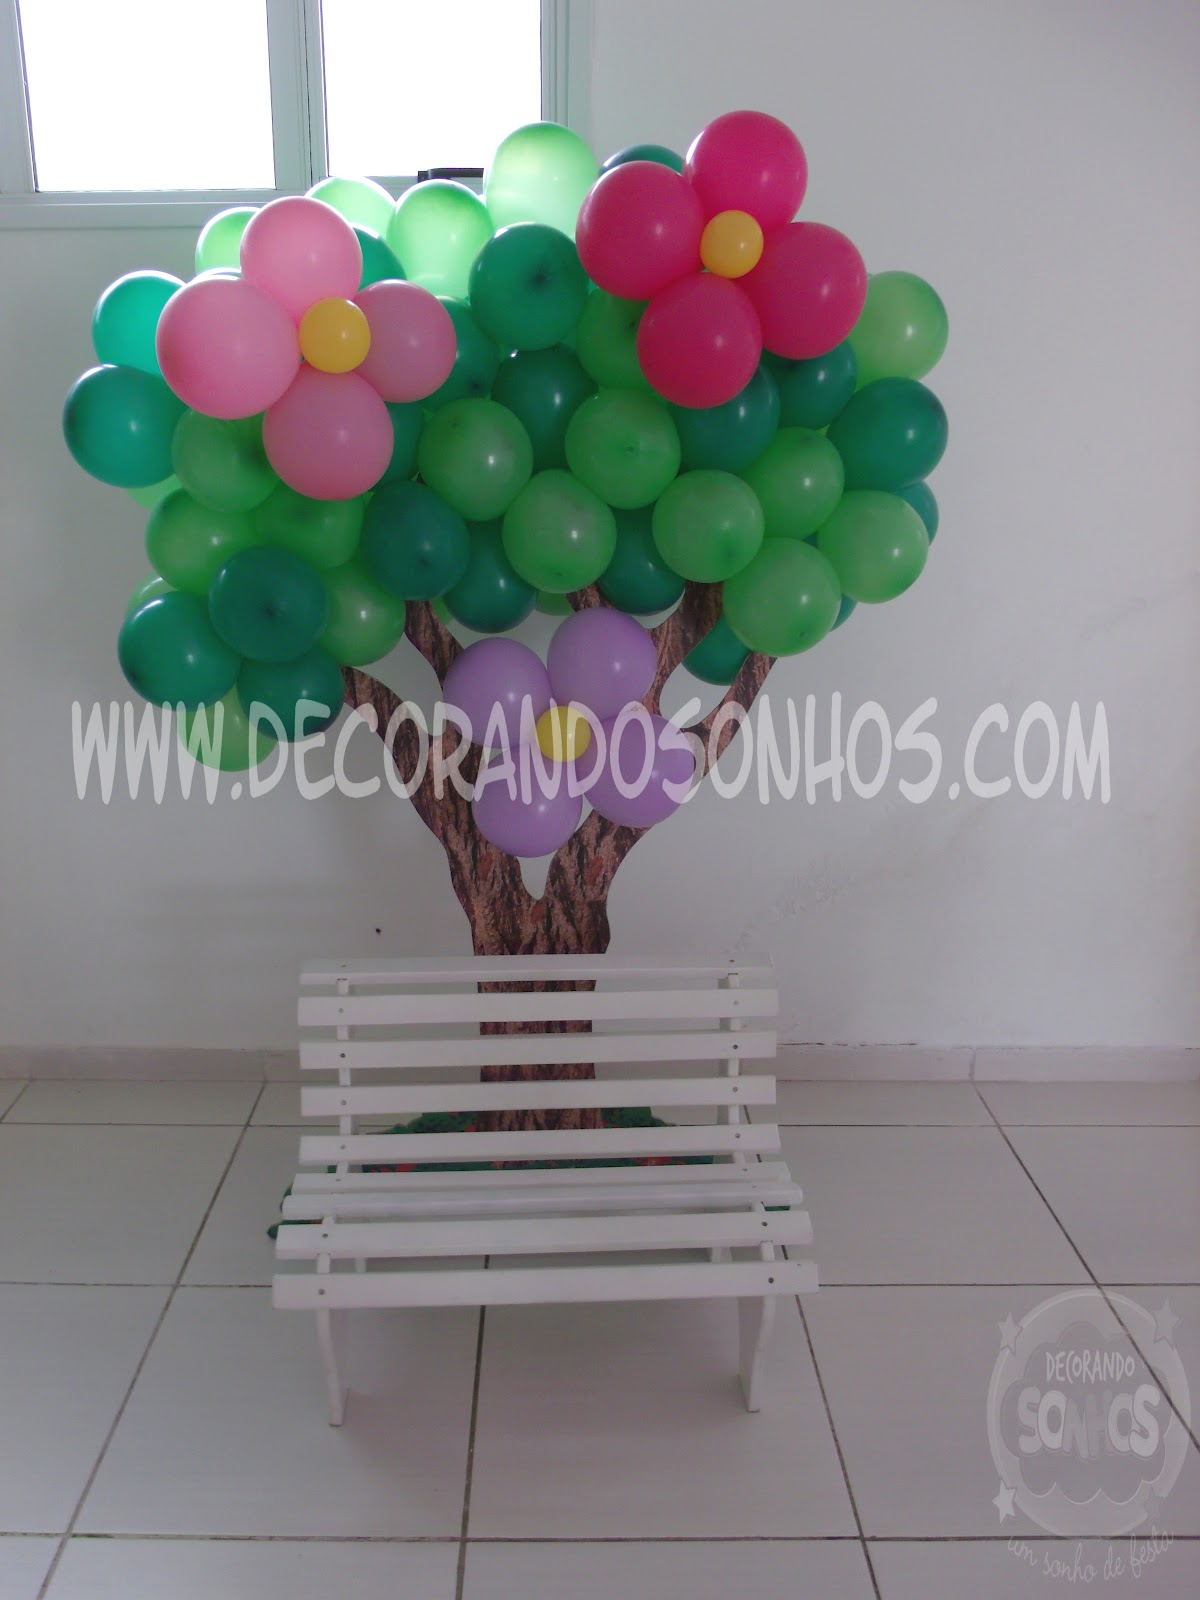 decoracao infantil jardim encantado provencal : decoracao infantil jardim encantado provencal:jardim+encantado+decoracao+provencal+jardim+encantado+decoracao